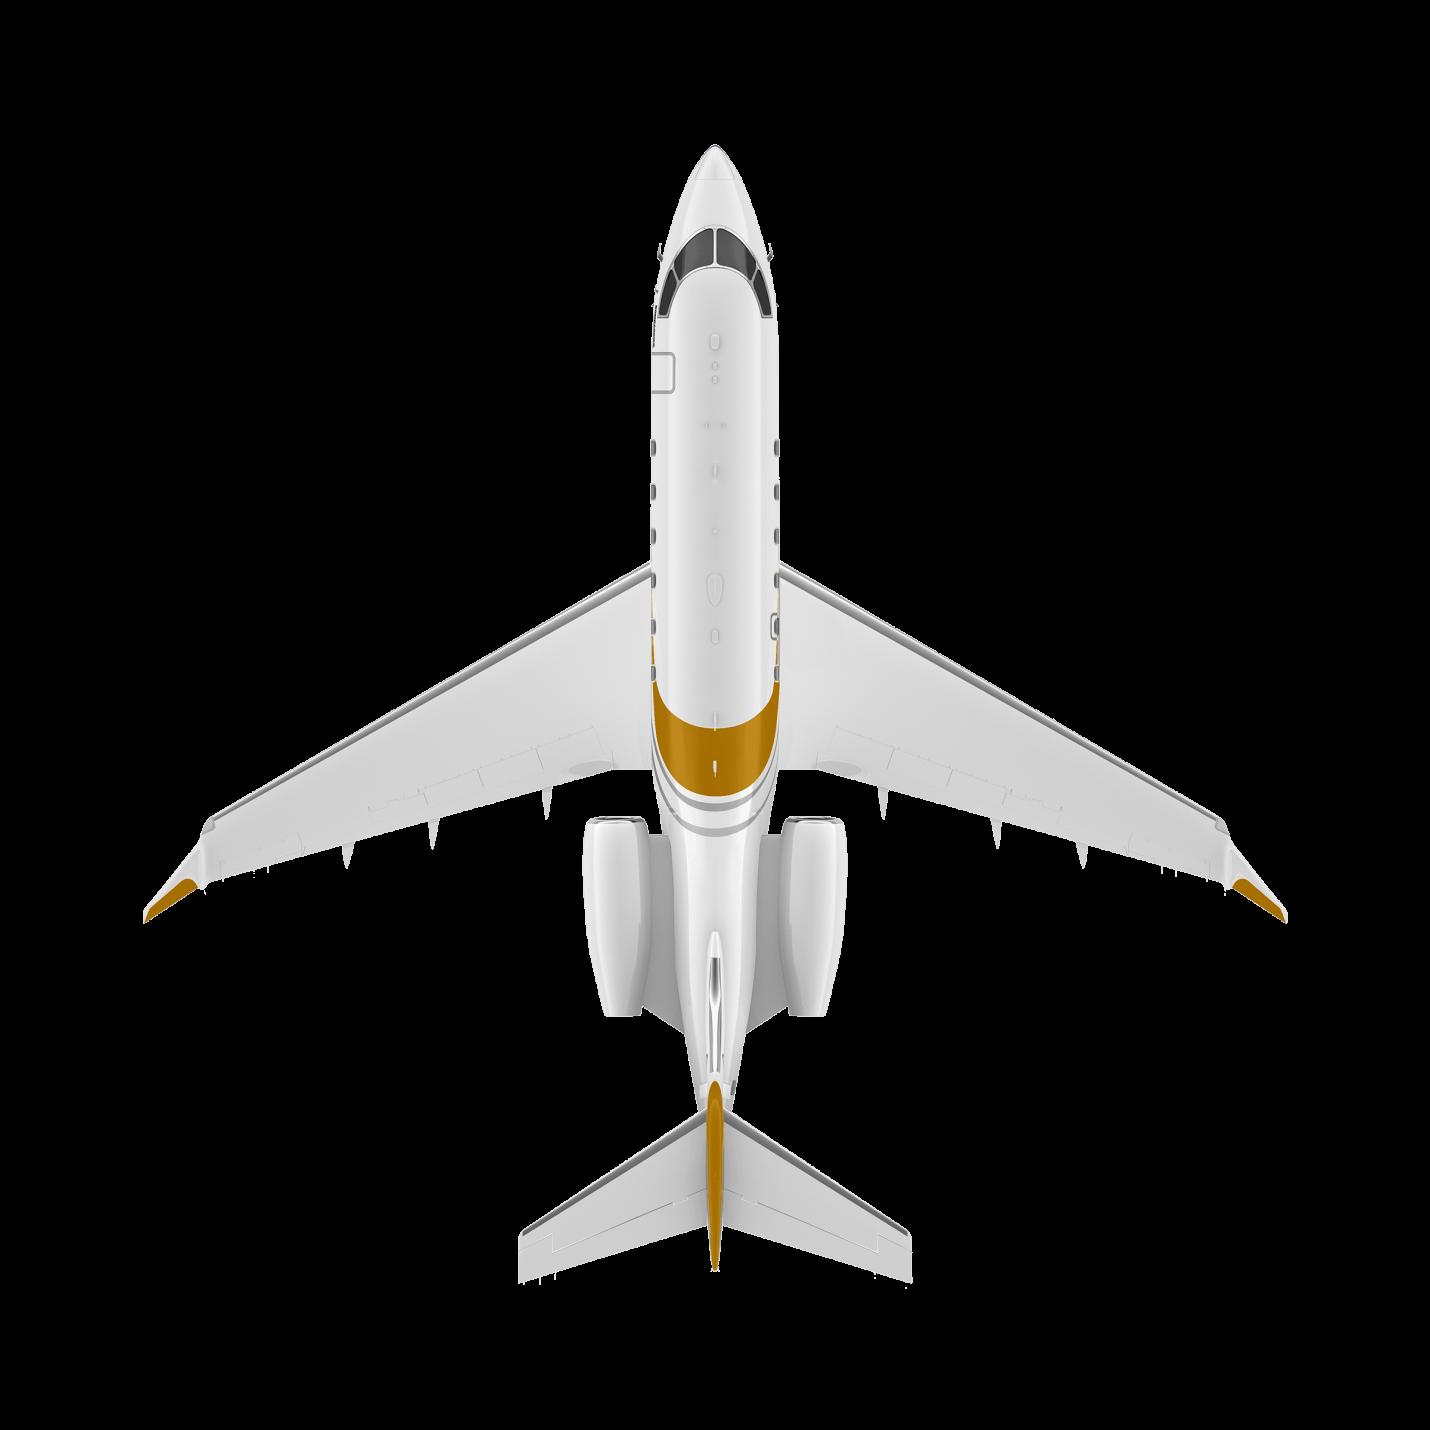 Challenger 350 top view